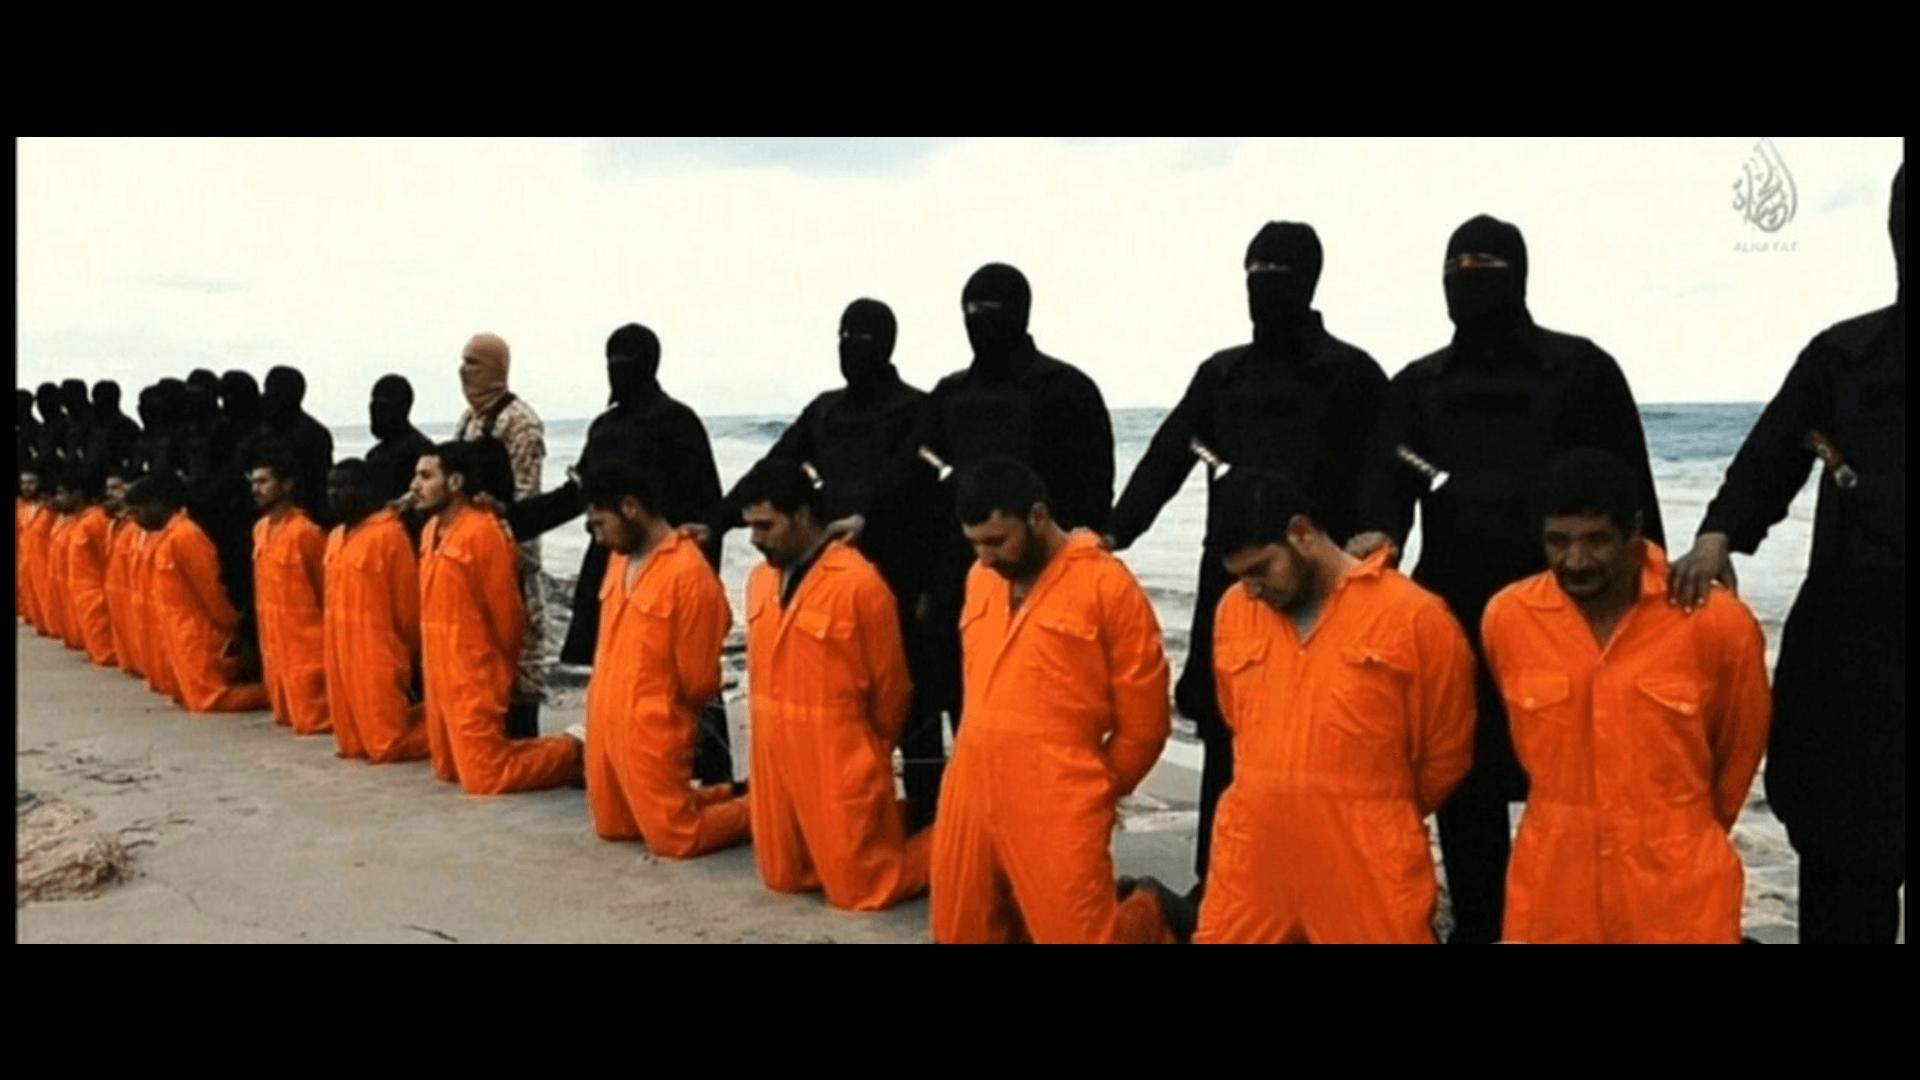 terrorismo - islamismo